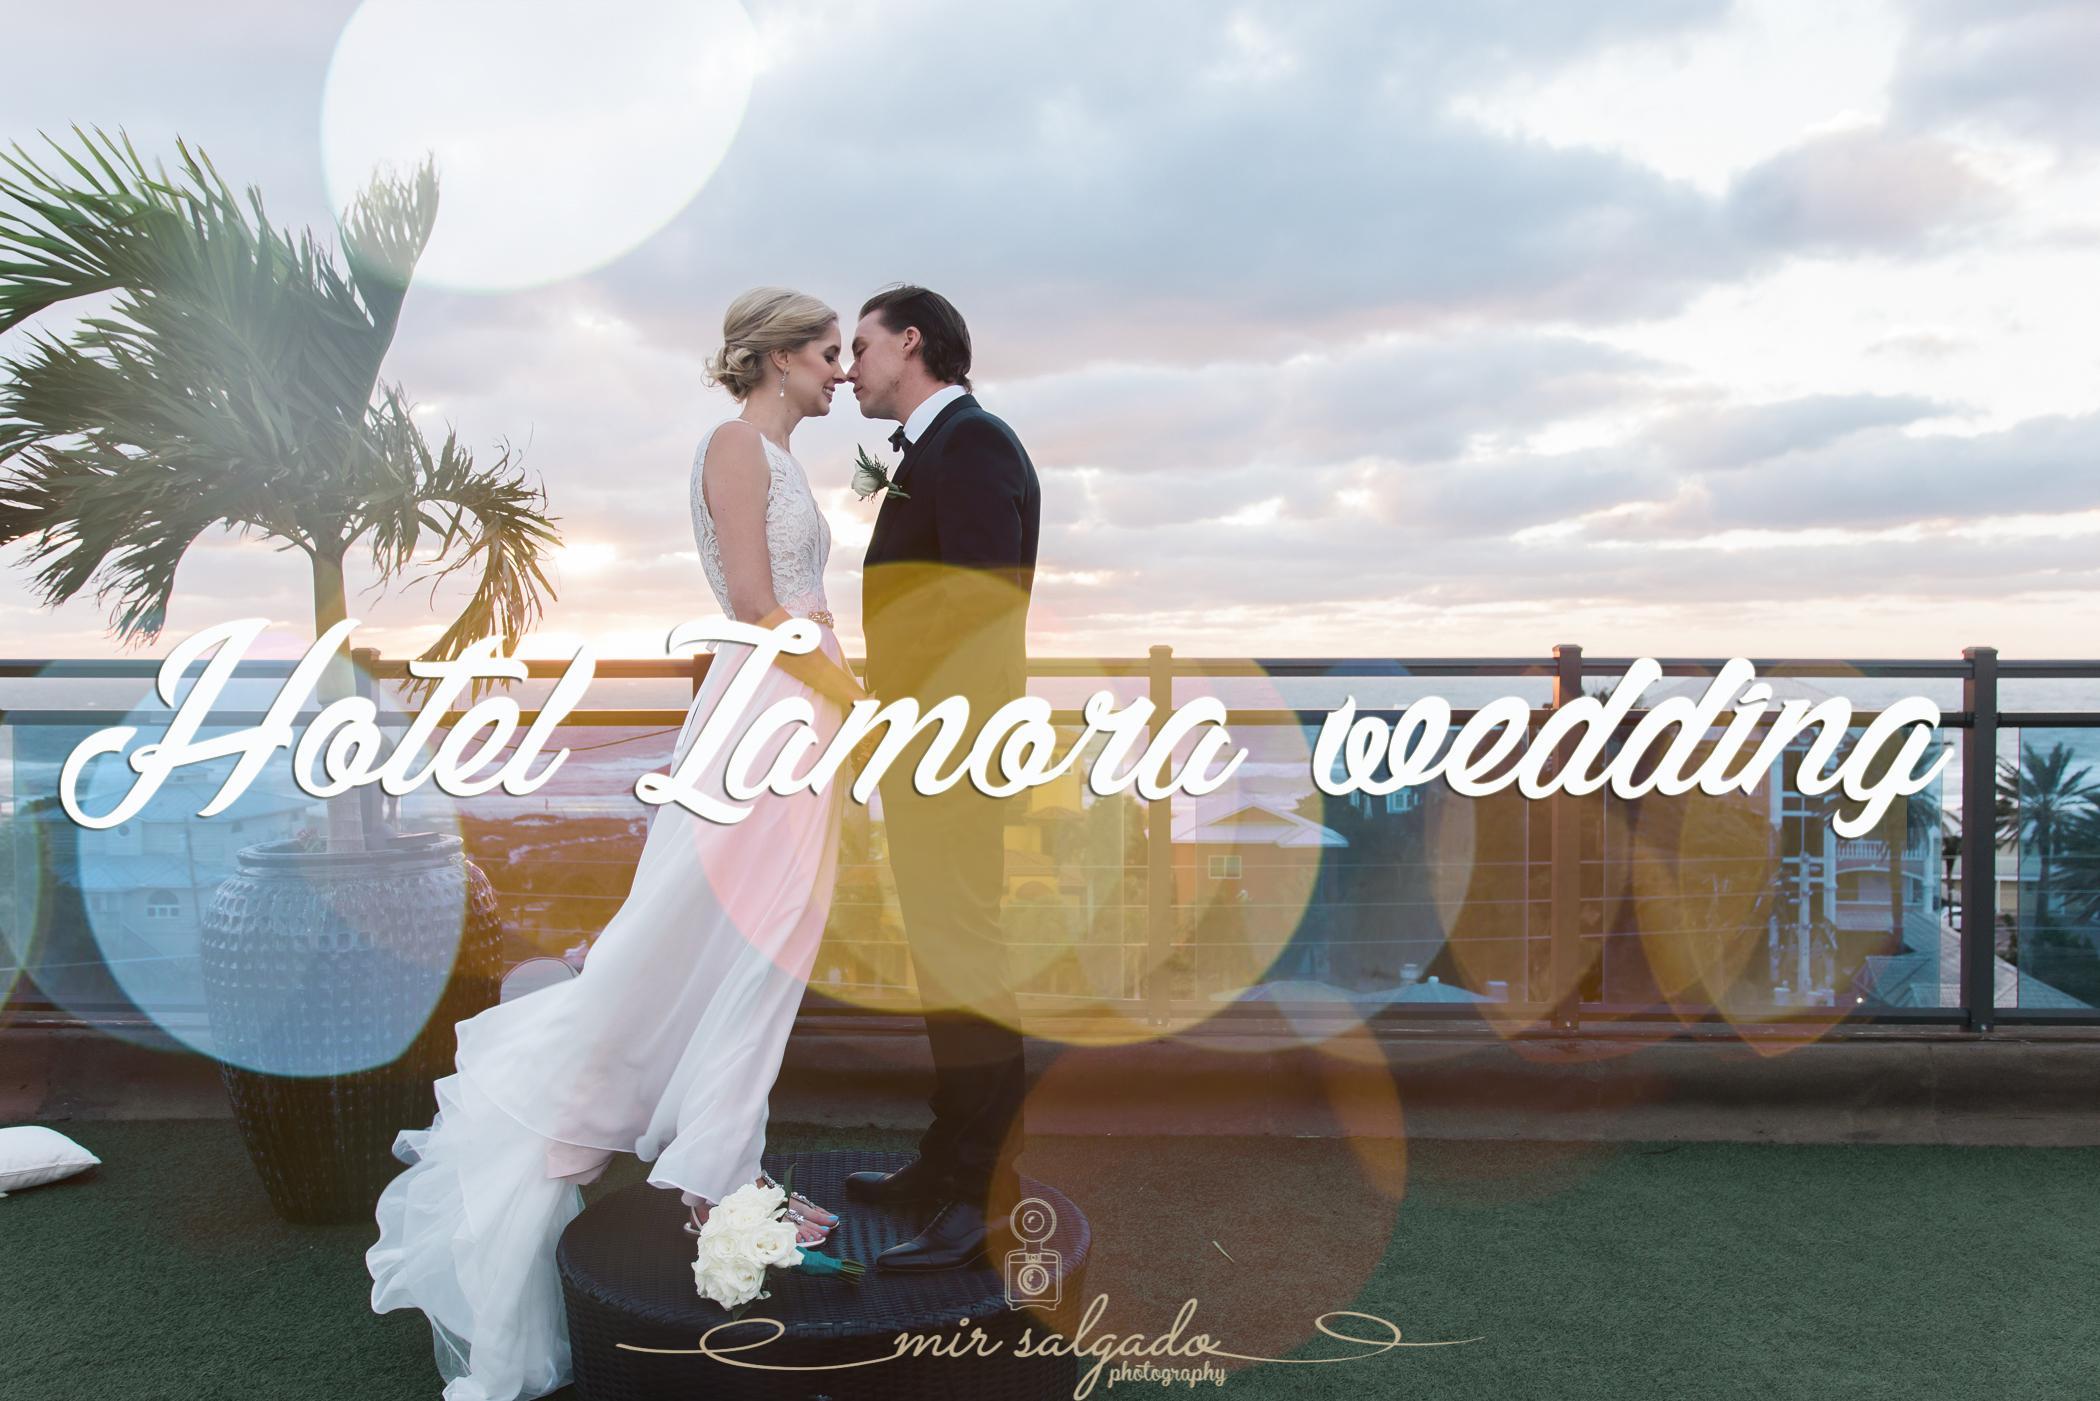 St.Pete-wedding-photo, Hotel-Zamora-wedding, St.Pete-wedding-photographer